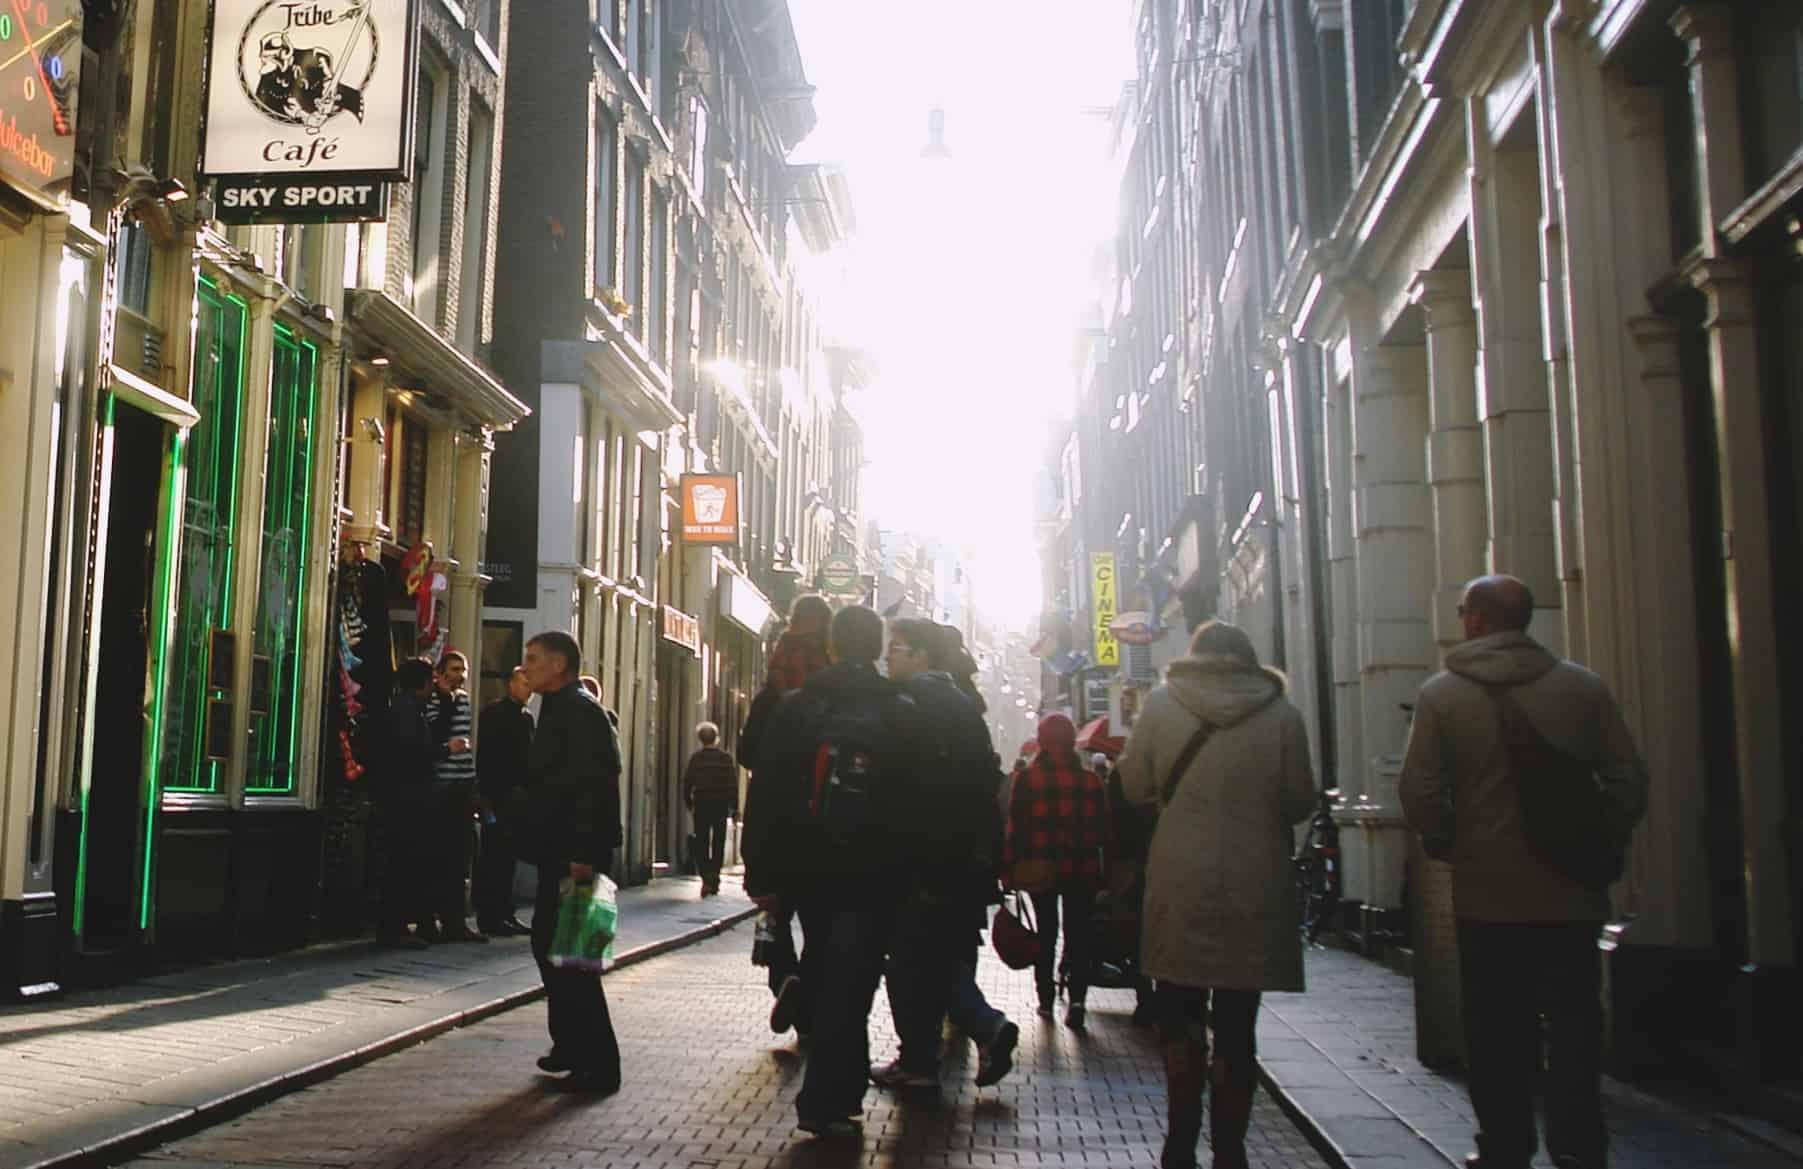 La historia de la calle Warmoesstraat